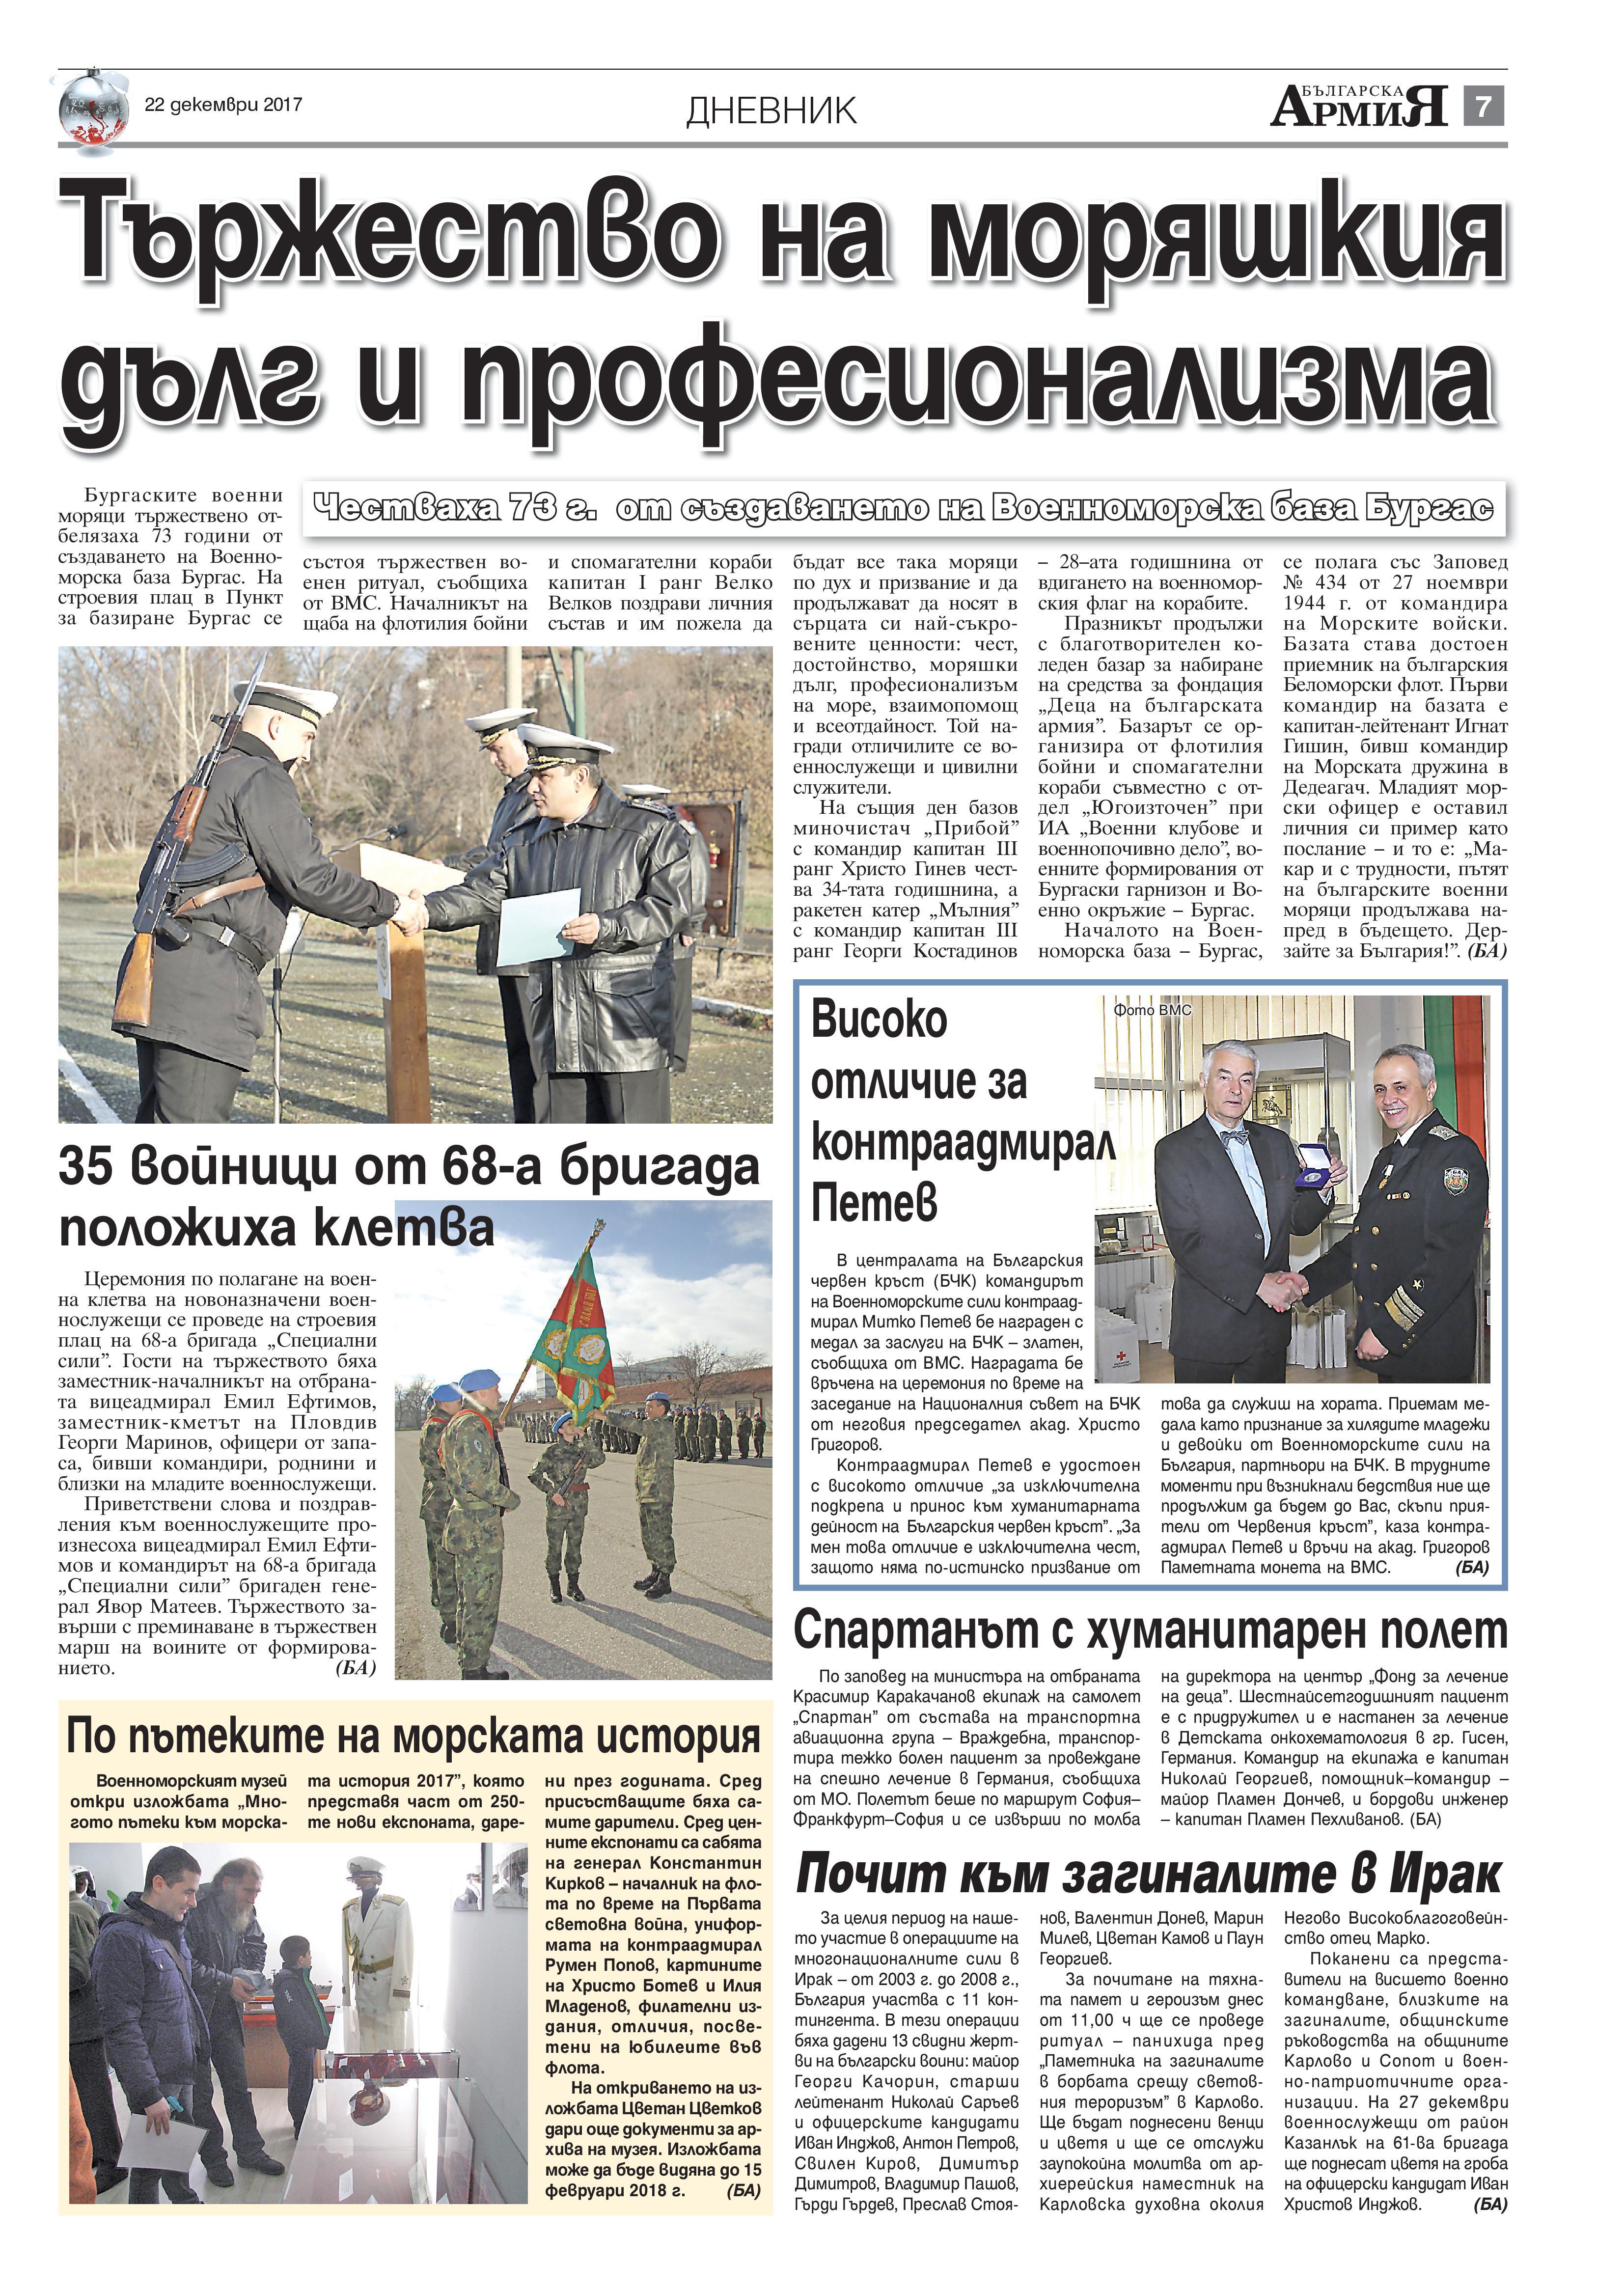 http://armymedia.bg/wp-content/uploads/2015/06/07-15.jpg